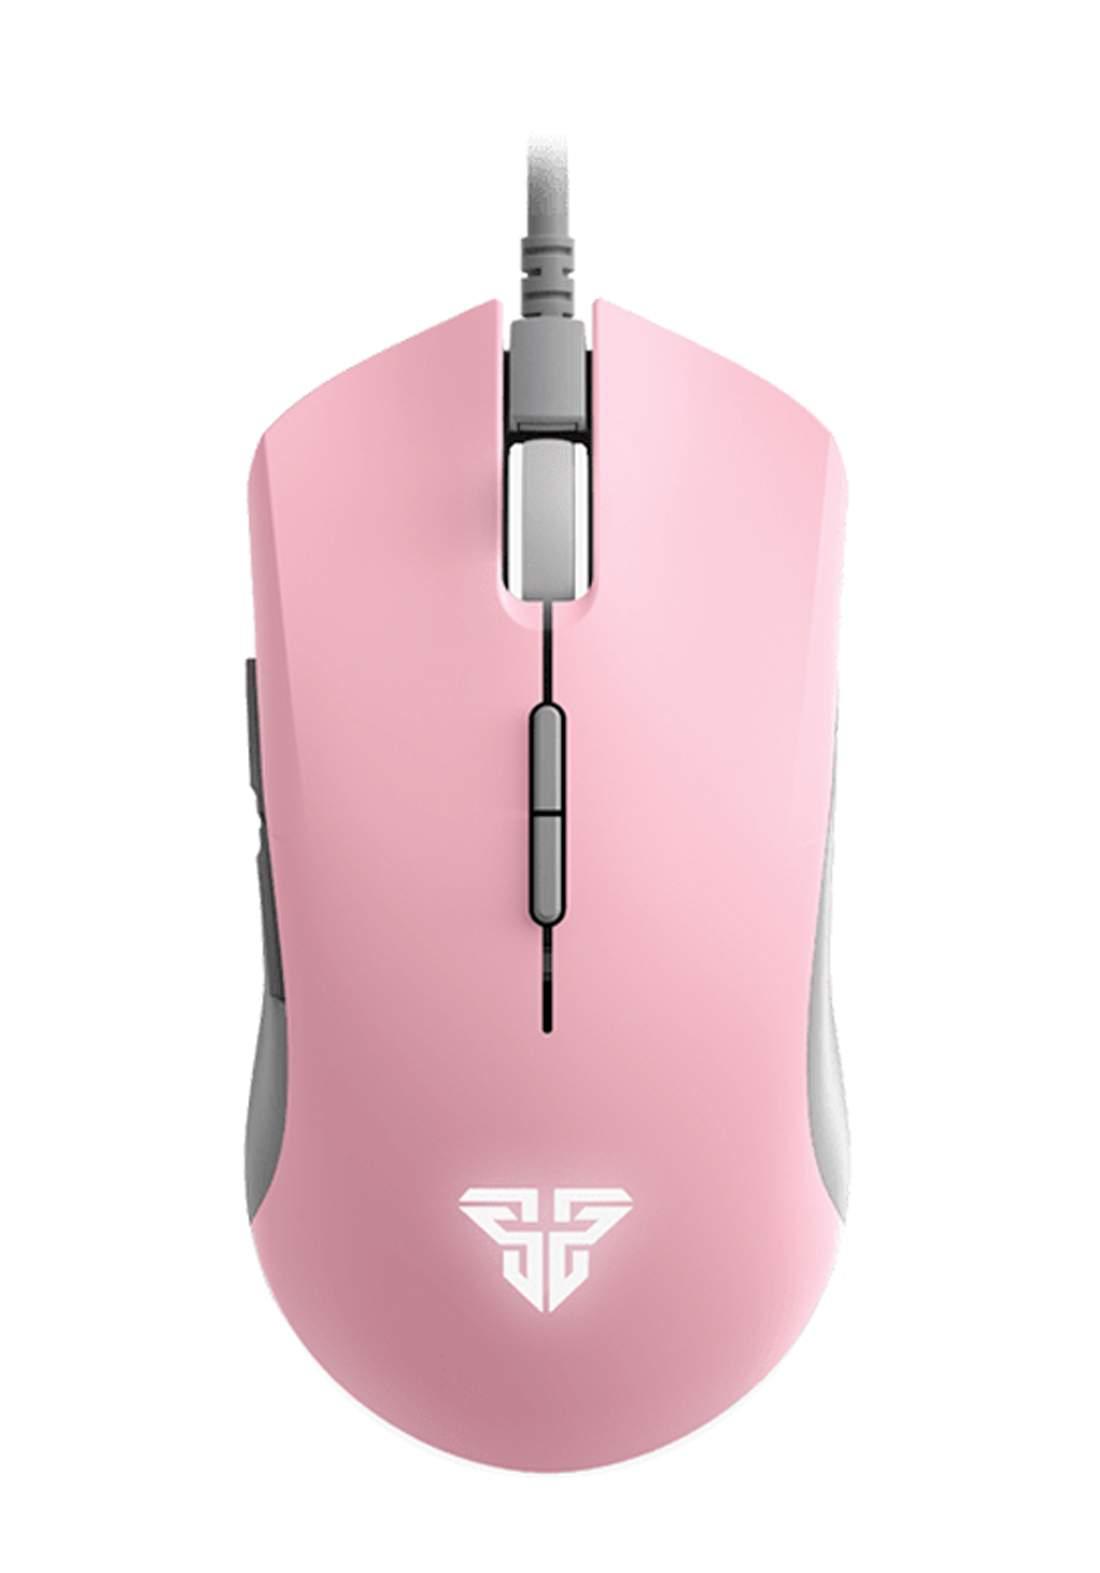 Fantech Blake X17 RGB Gaming Mouse